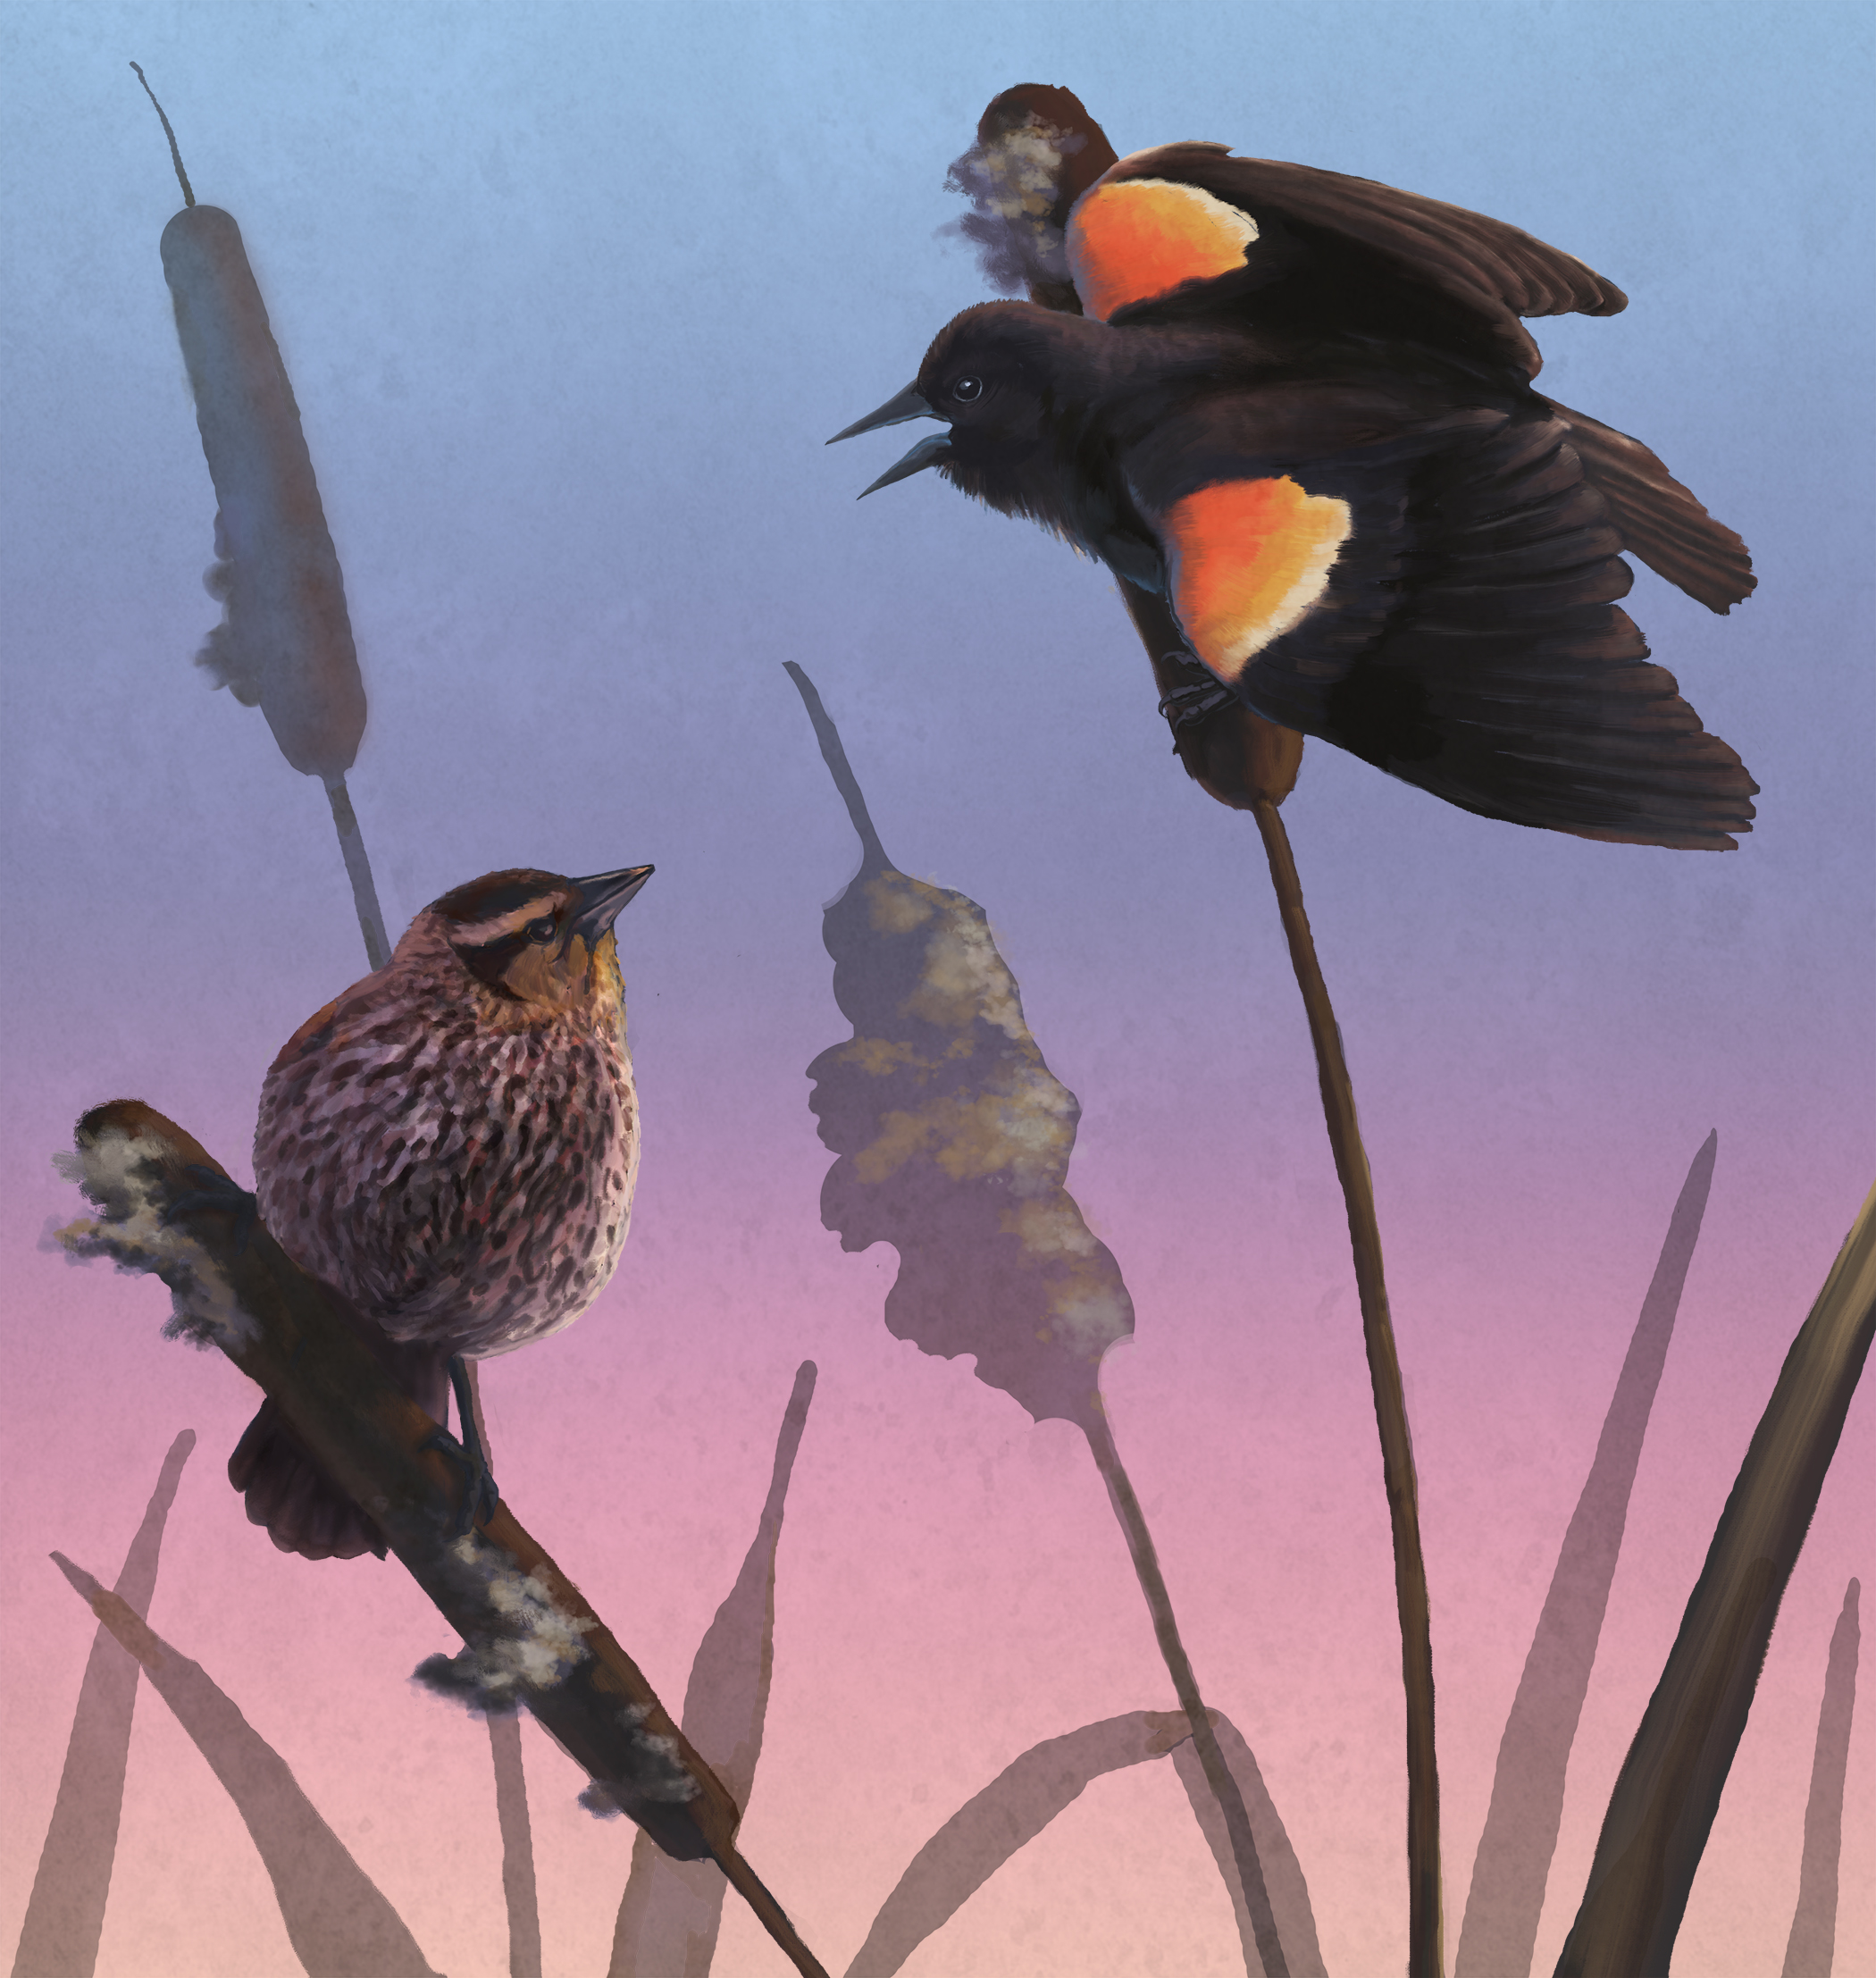 Red-Winged Black Bird Dimorphism